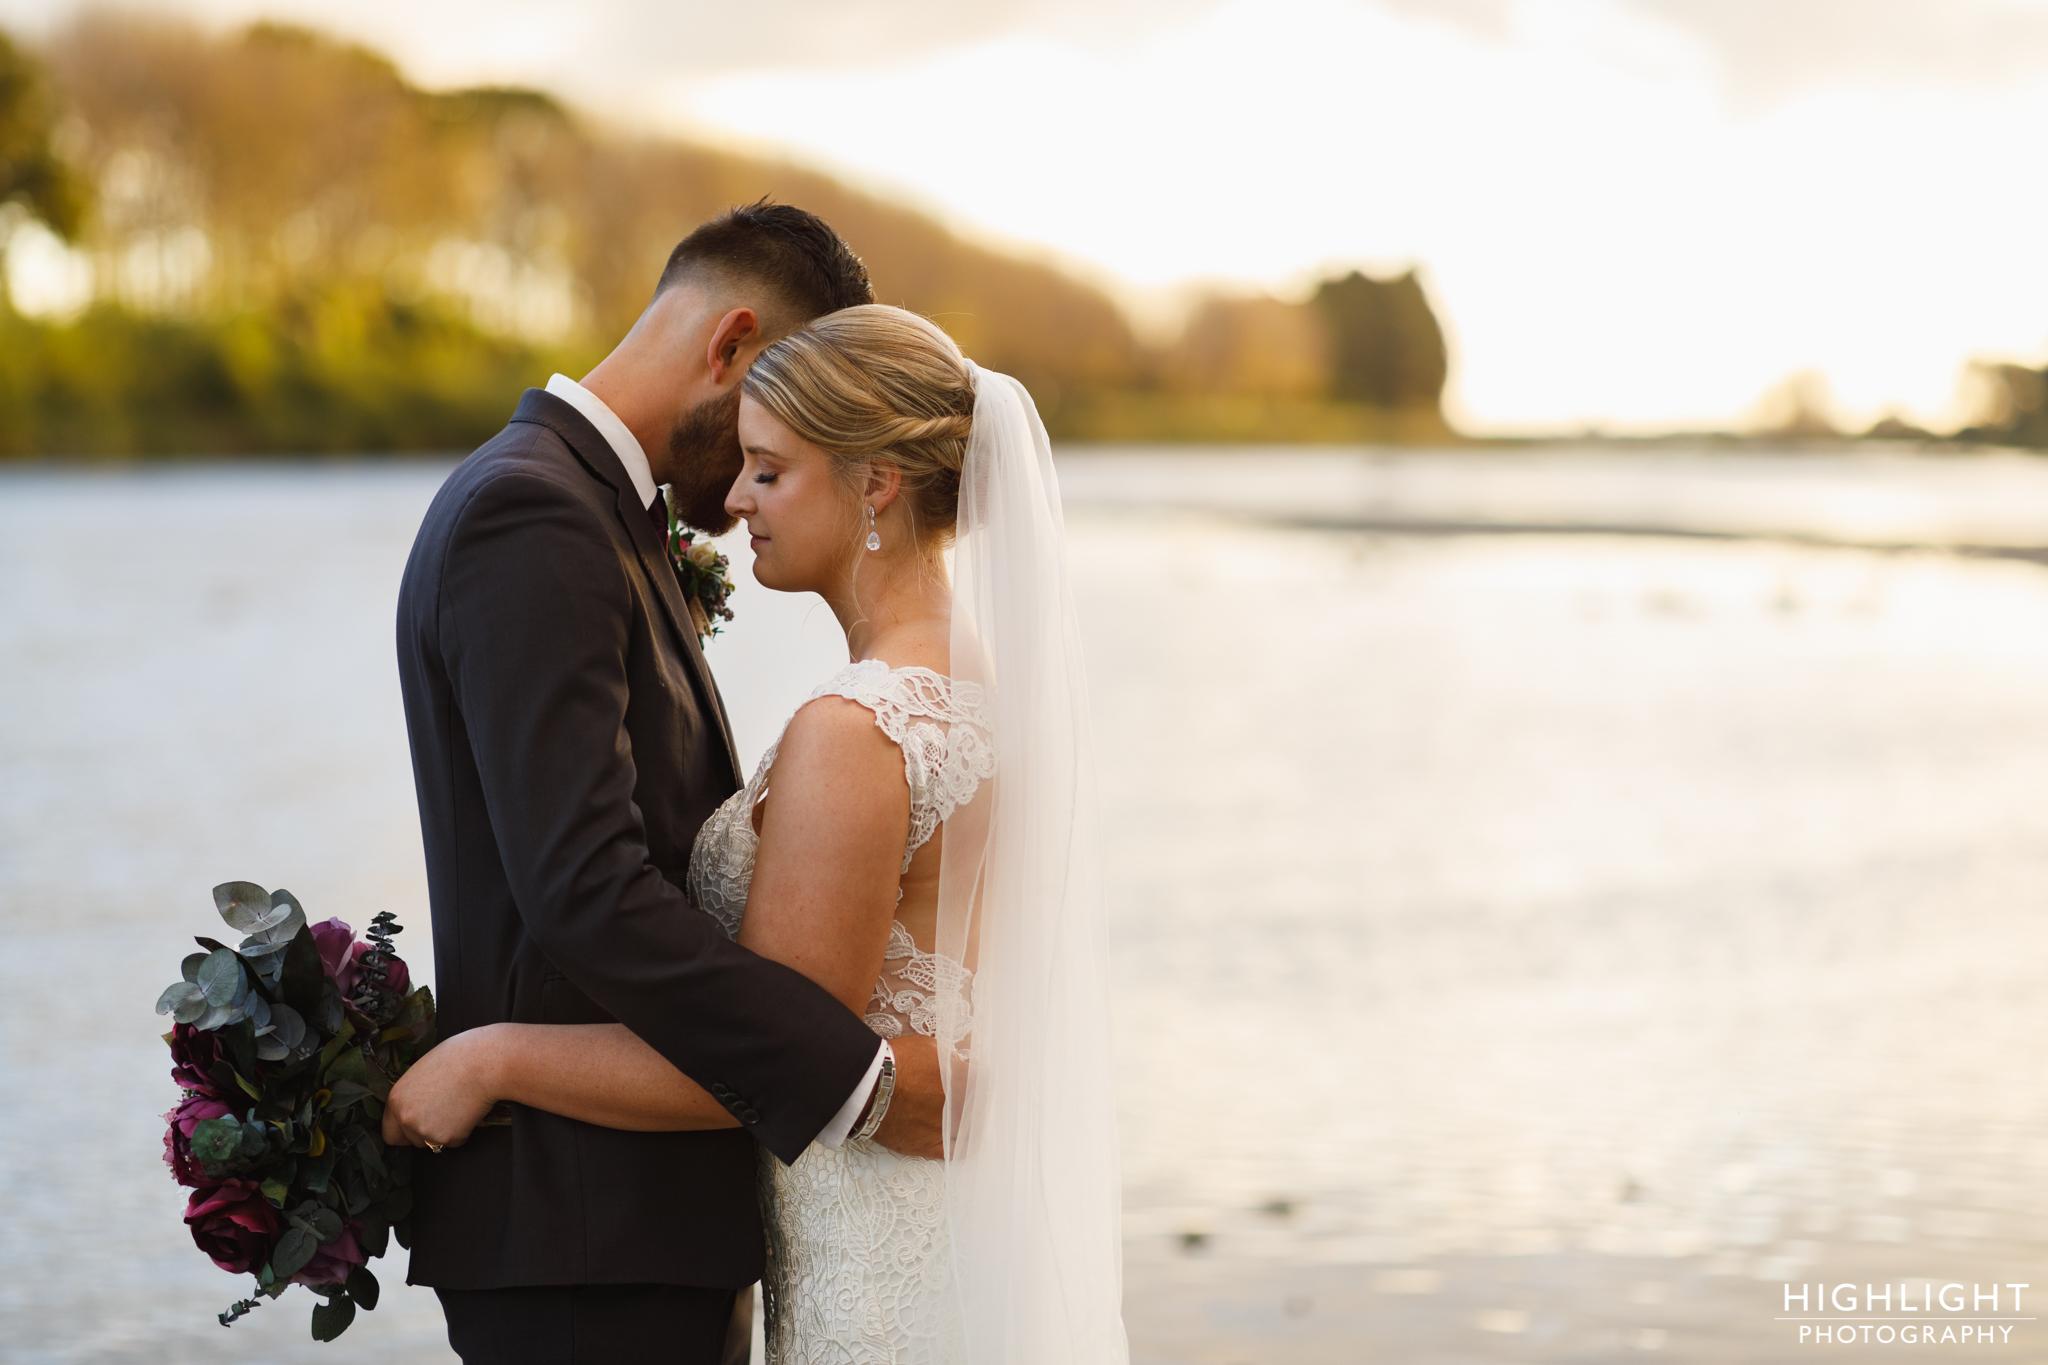 highlight-wedding-photography-feilding-new-zealand-159.jpg